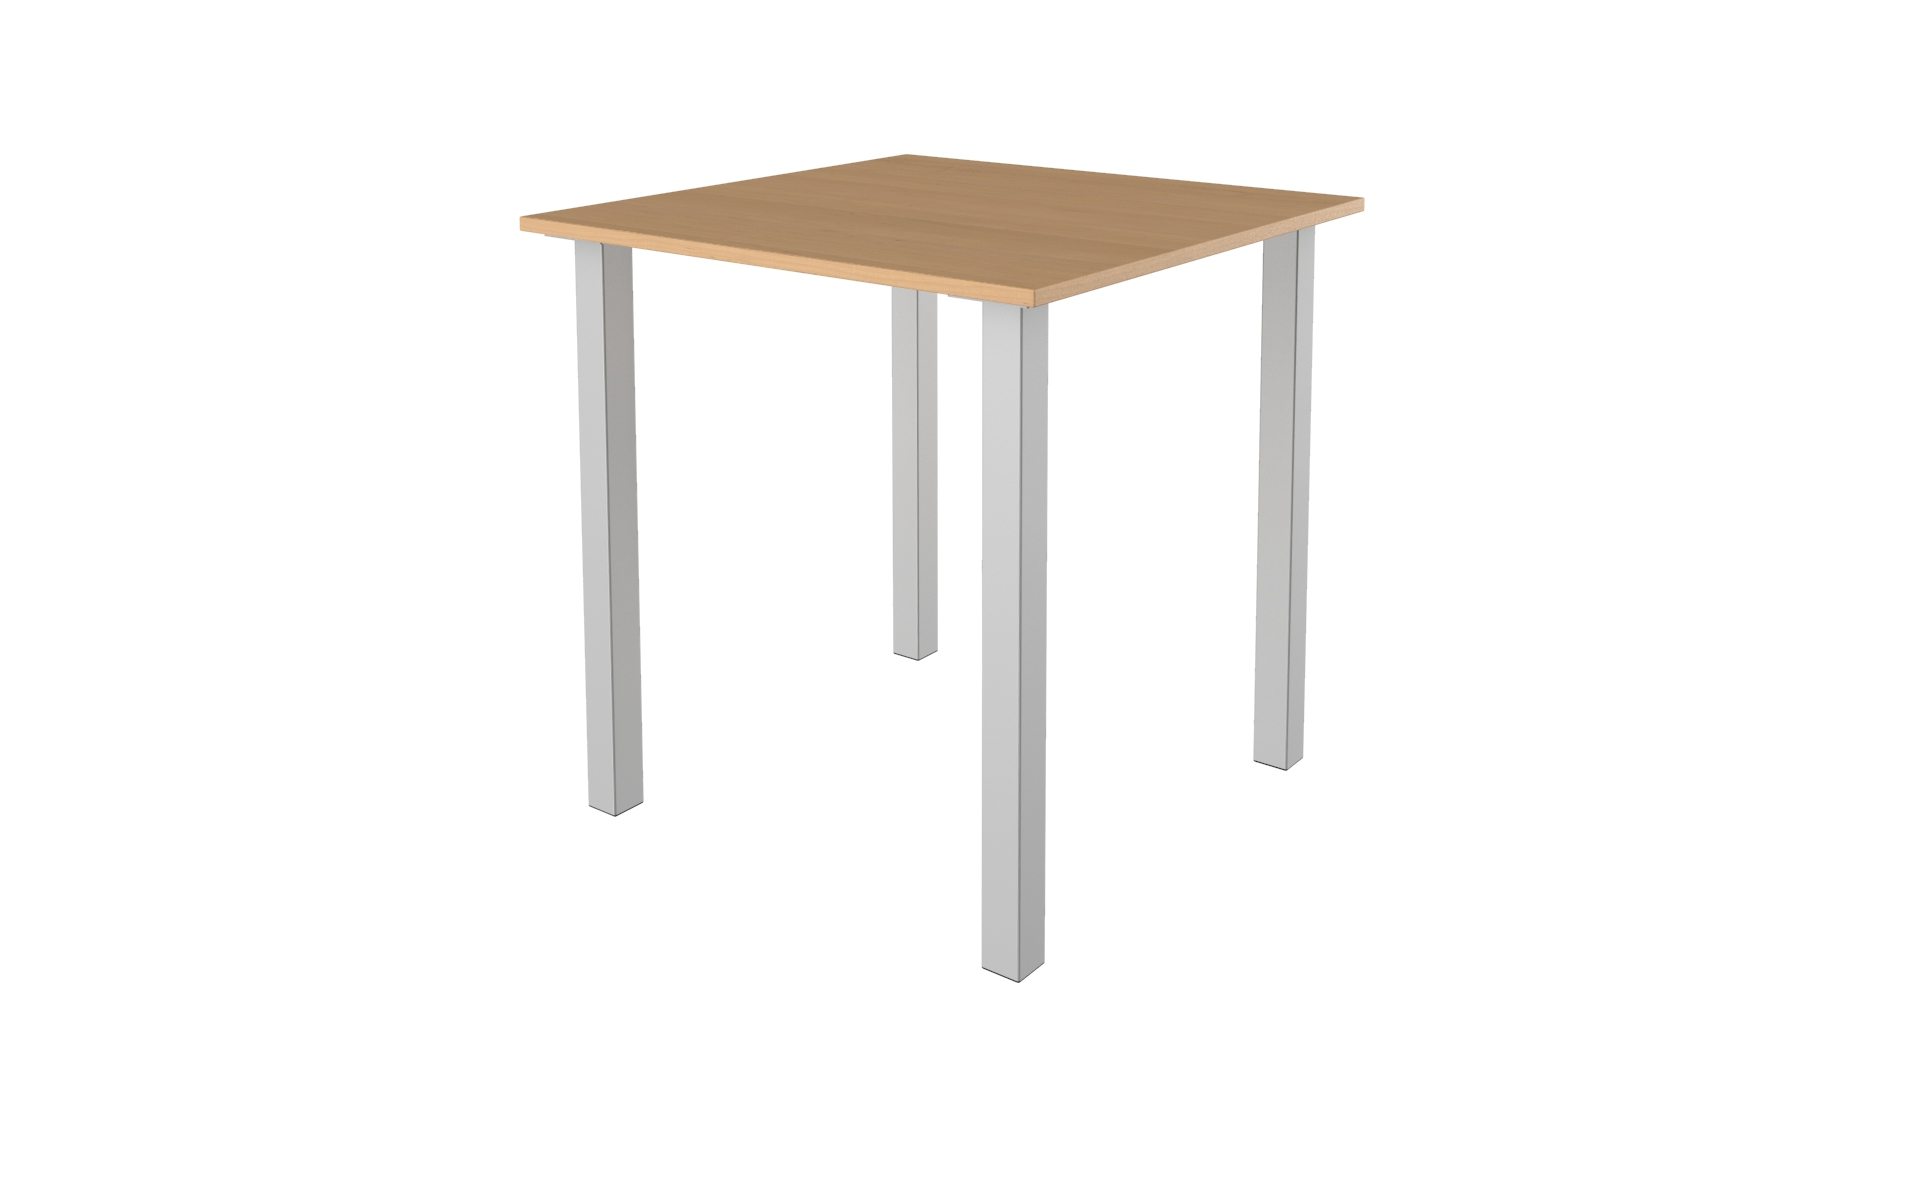 4 leg table 30.1705.jpg